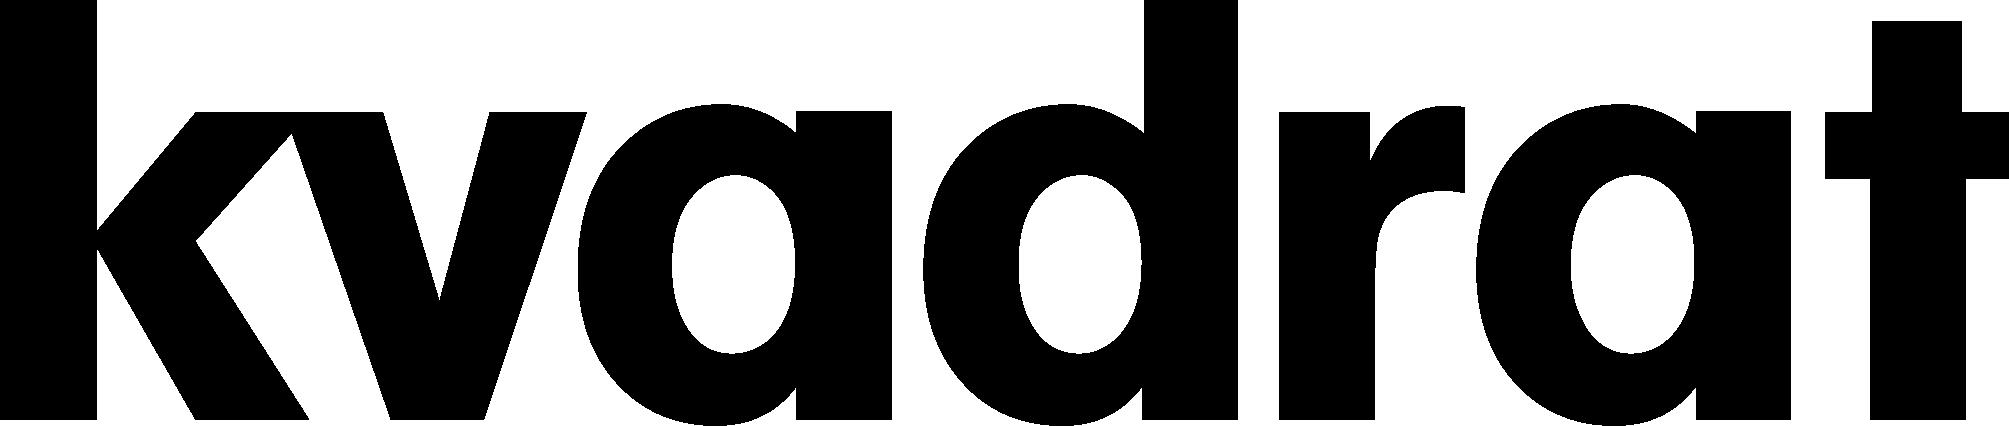 Kvadrat Ltd